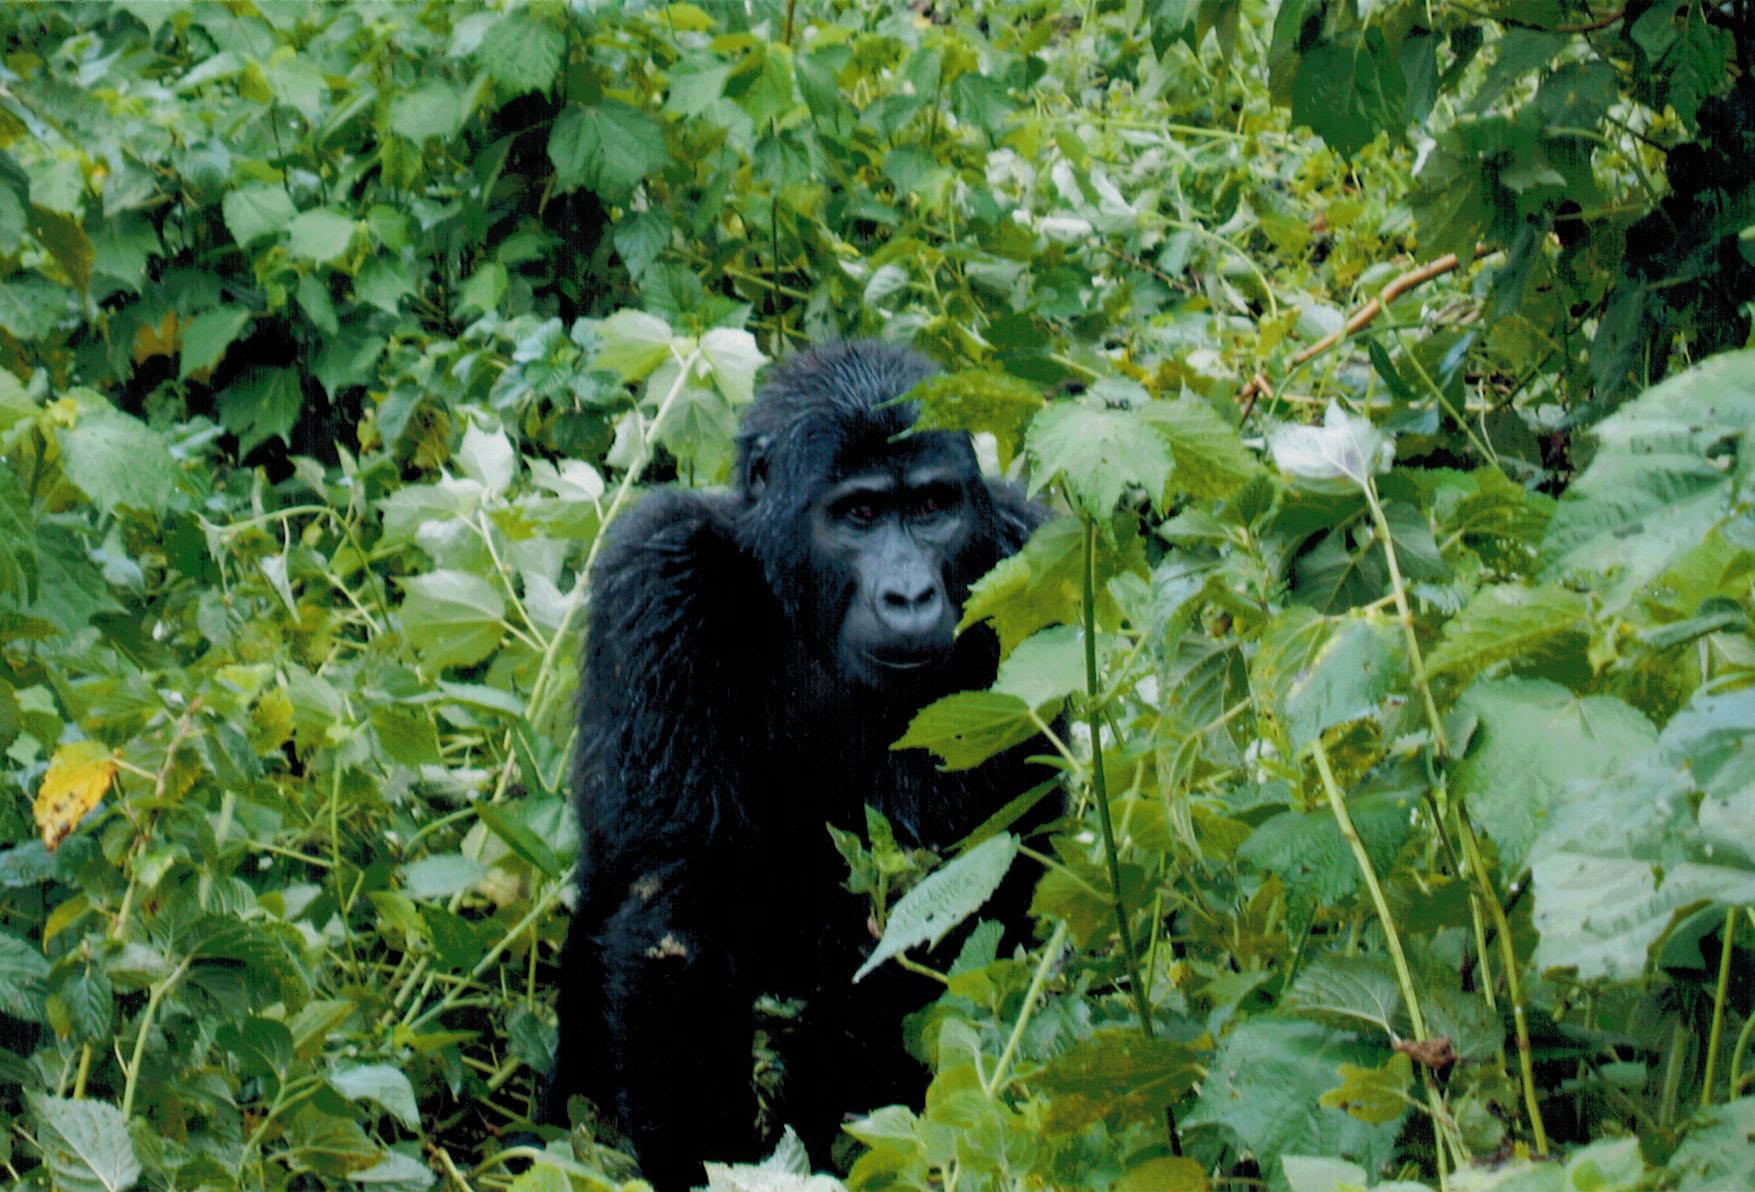 Mountain gorilla in Uganda's Bwindi Impenetrable National Park